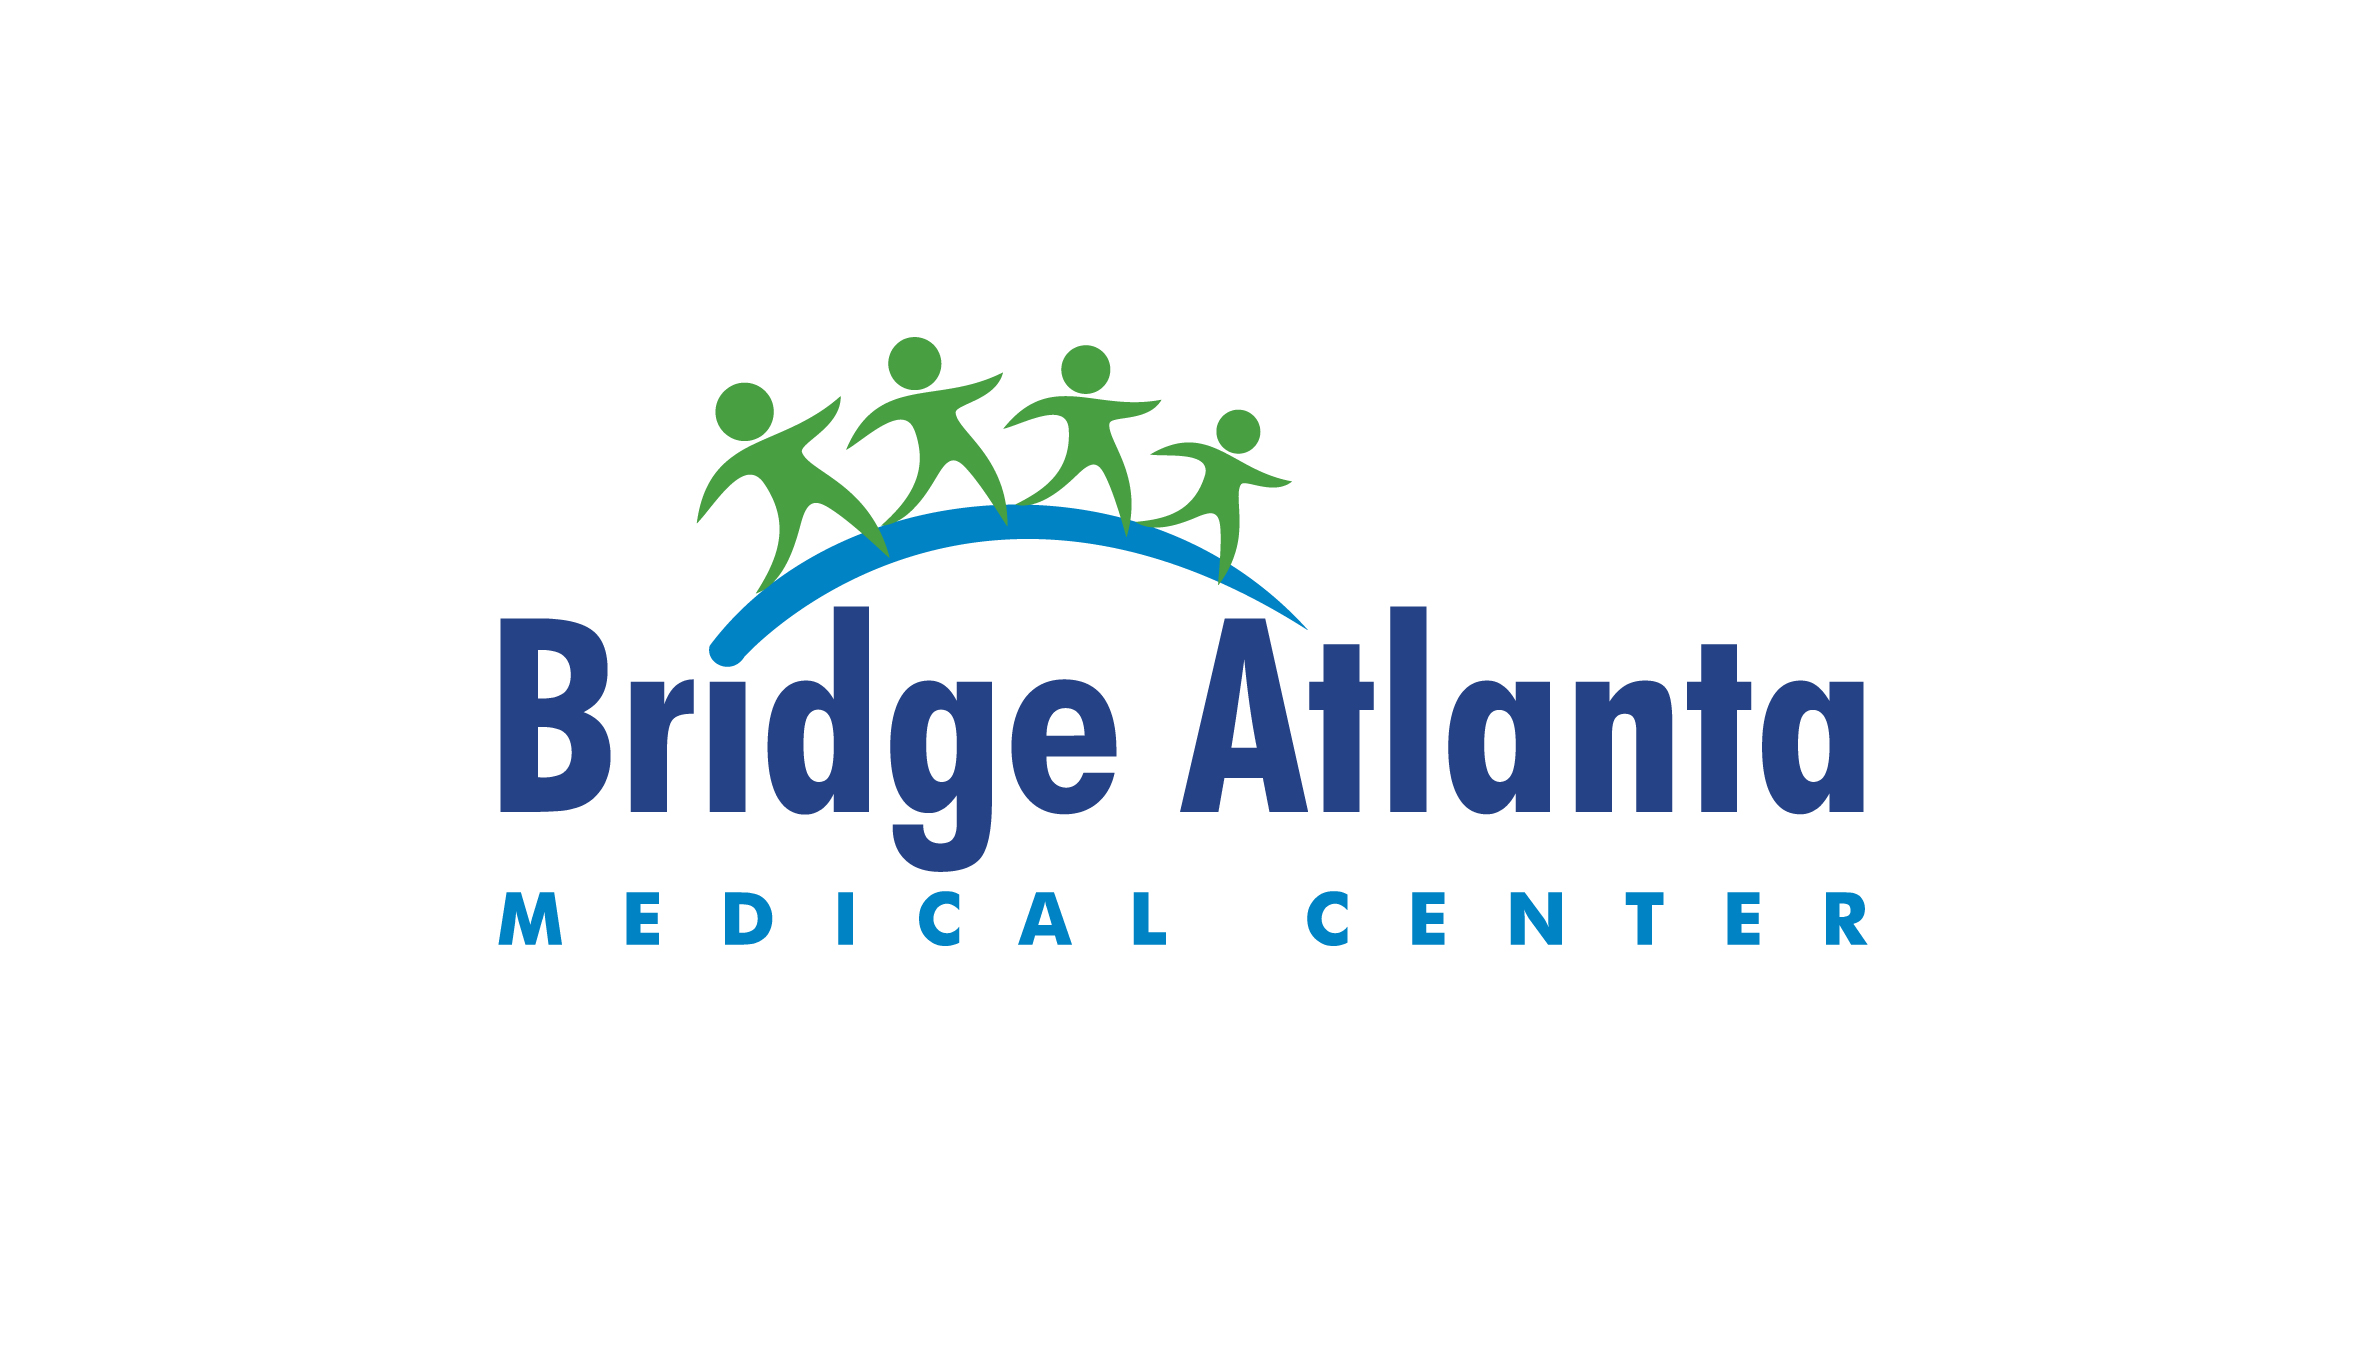 2014-8-20The bridge Atlanta Medical Center_logo-RGB [Converted]